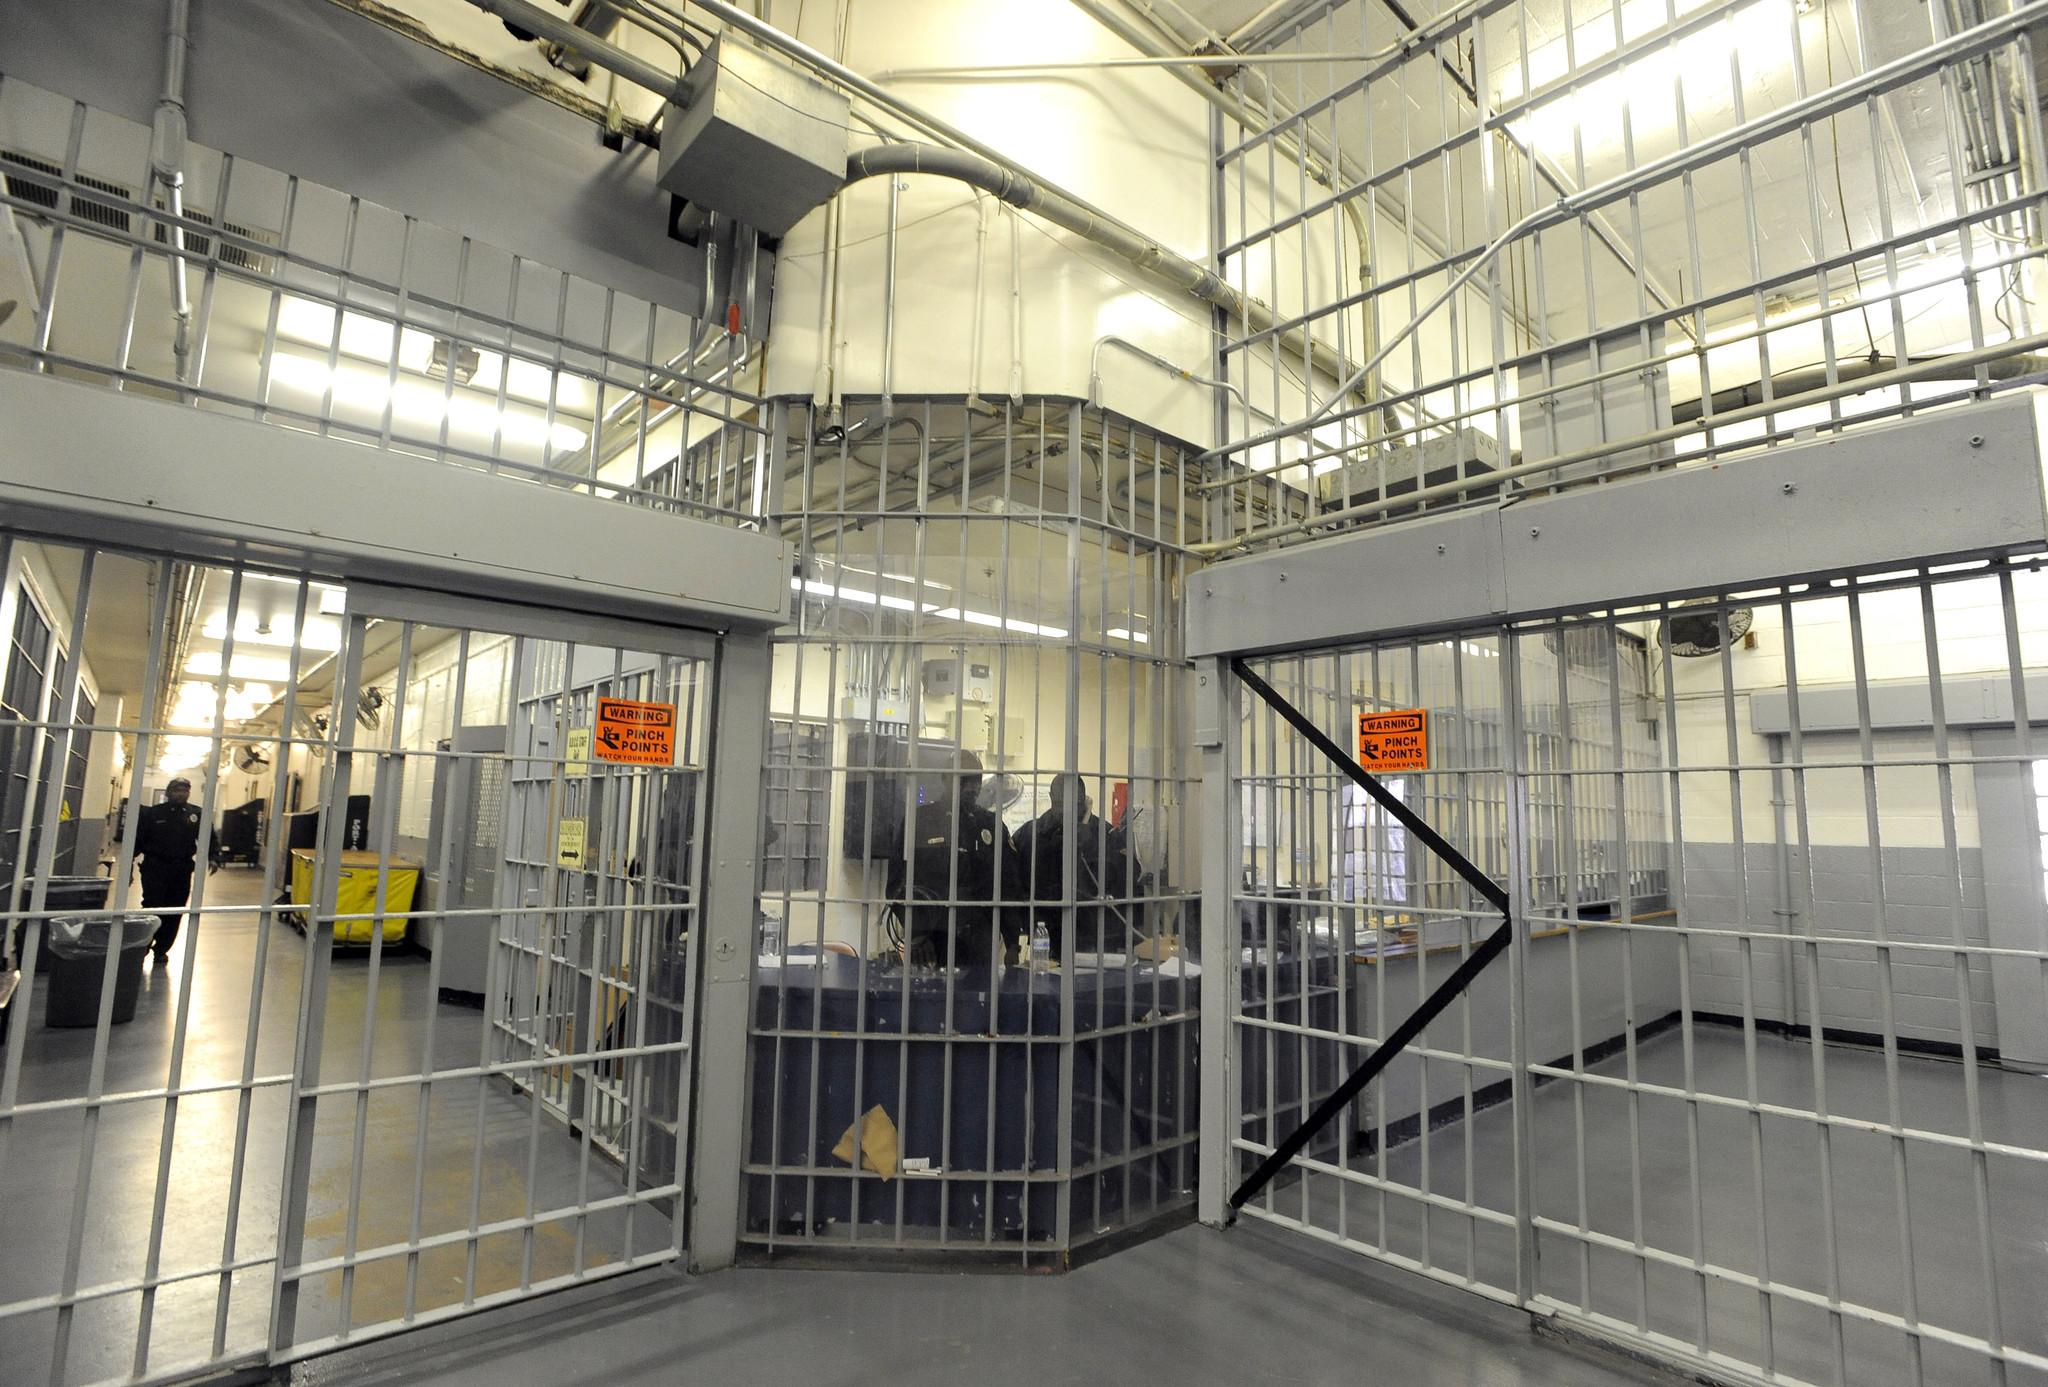 Baltimore Jail Complex Again Faces Lawsuit Over Health